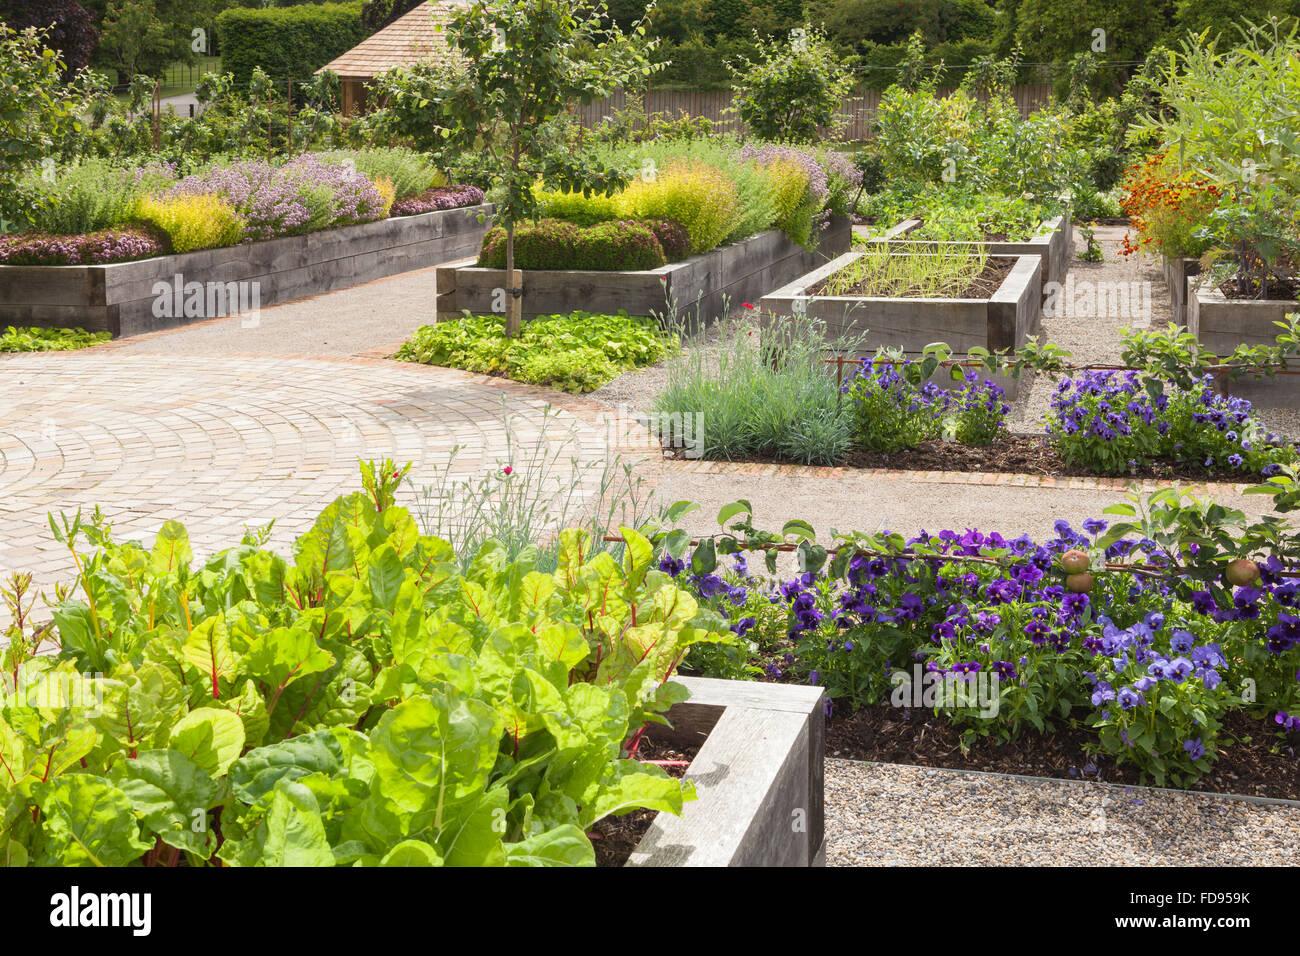 The Kitchen Garden at Rudding Park, North Yorkshire, UK. Summer, July 2015. Stock Photo